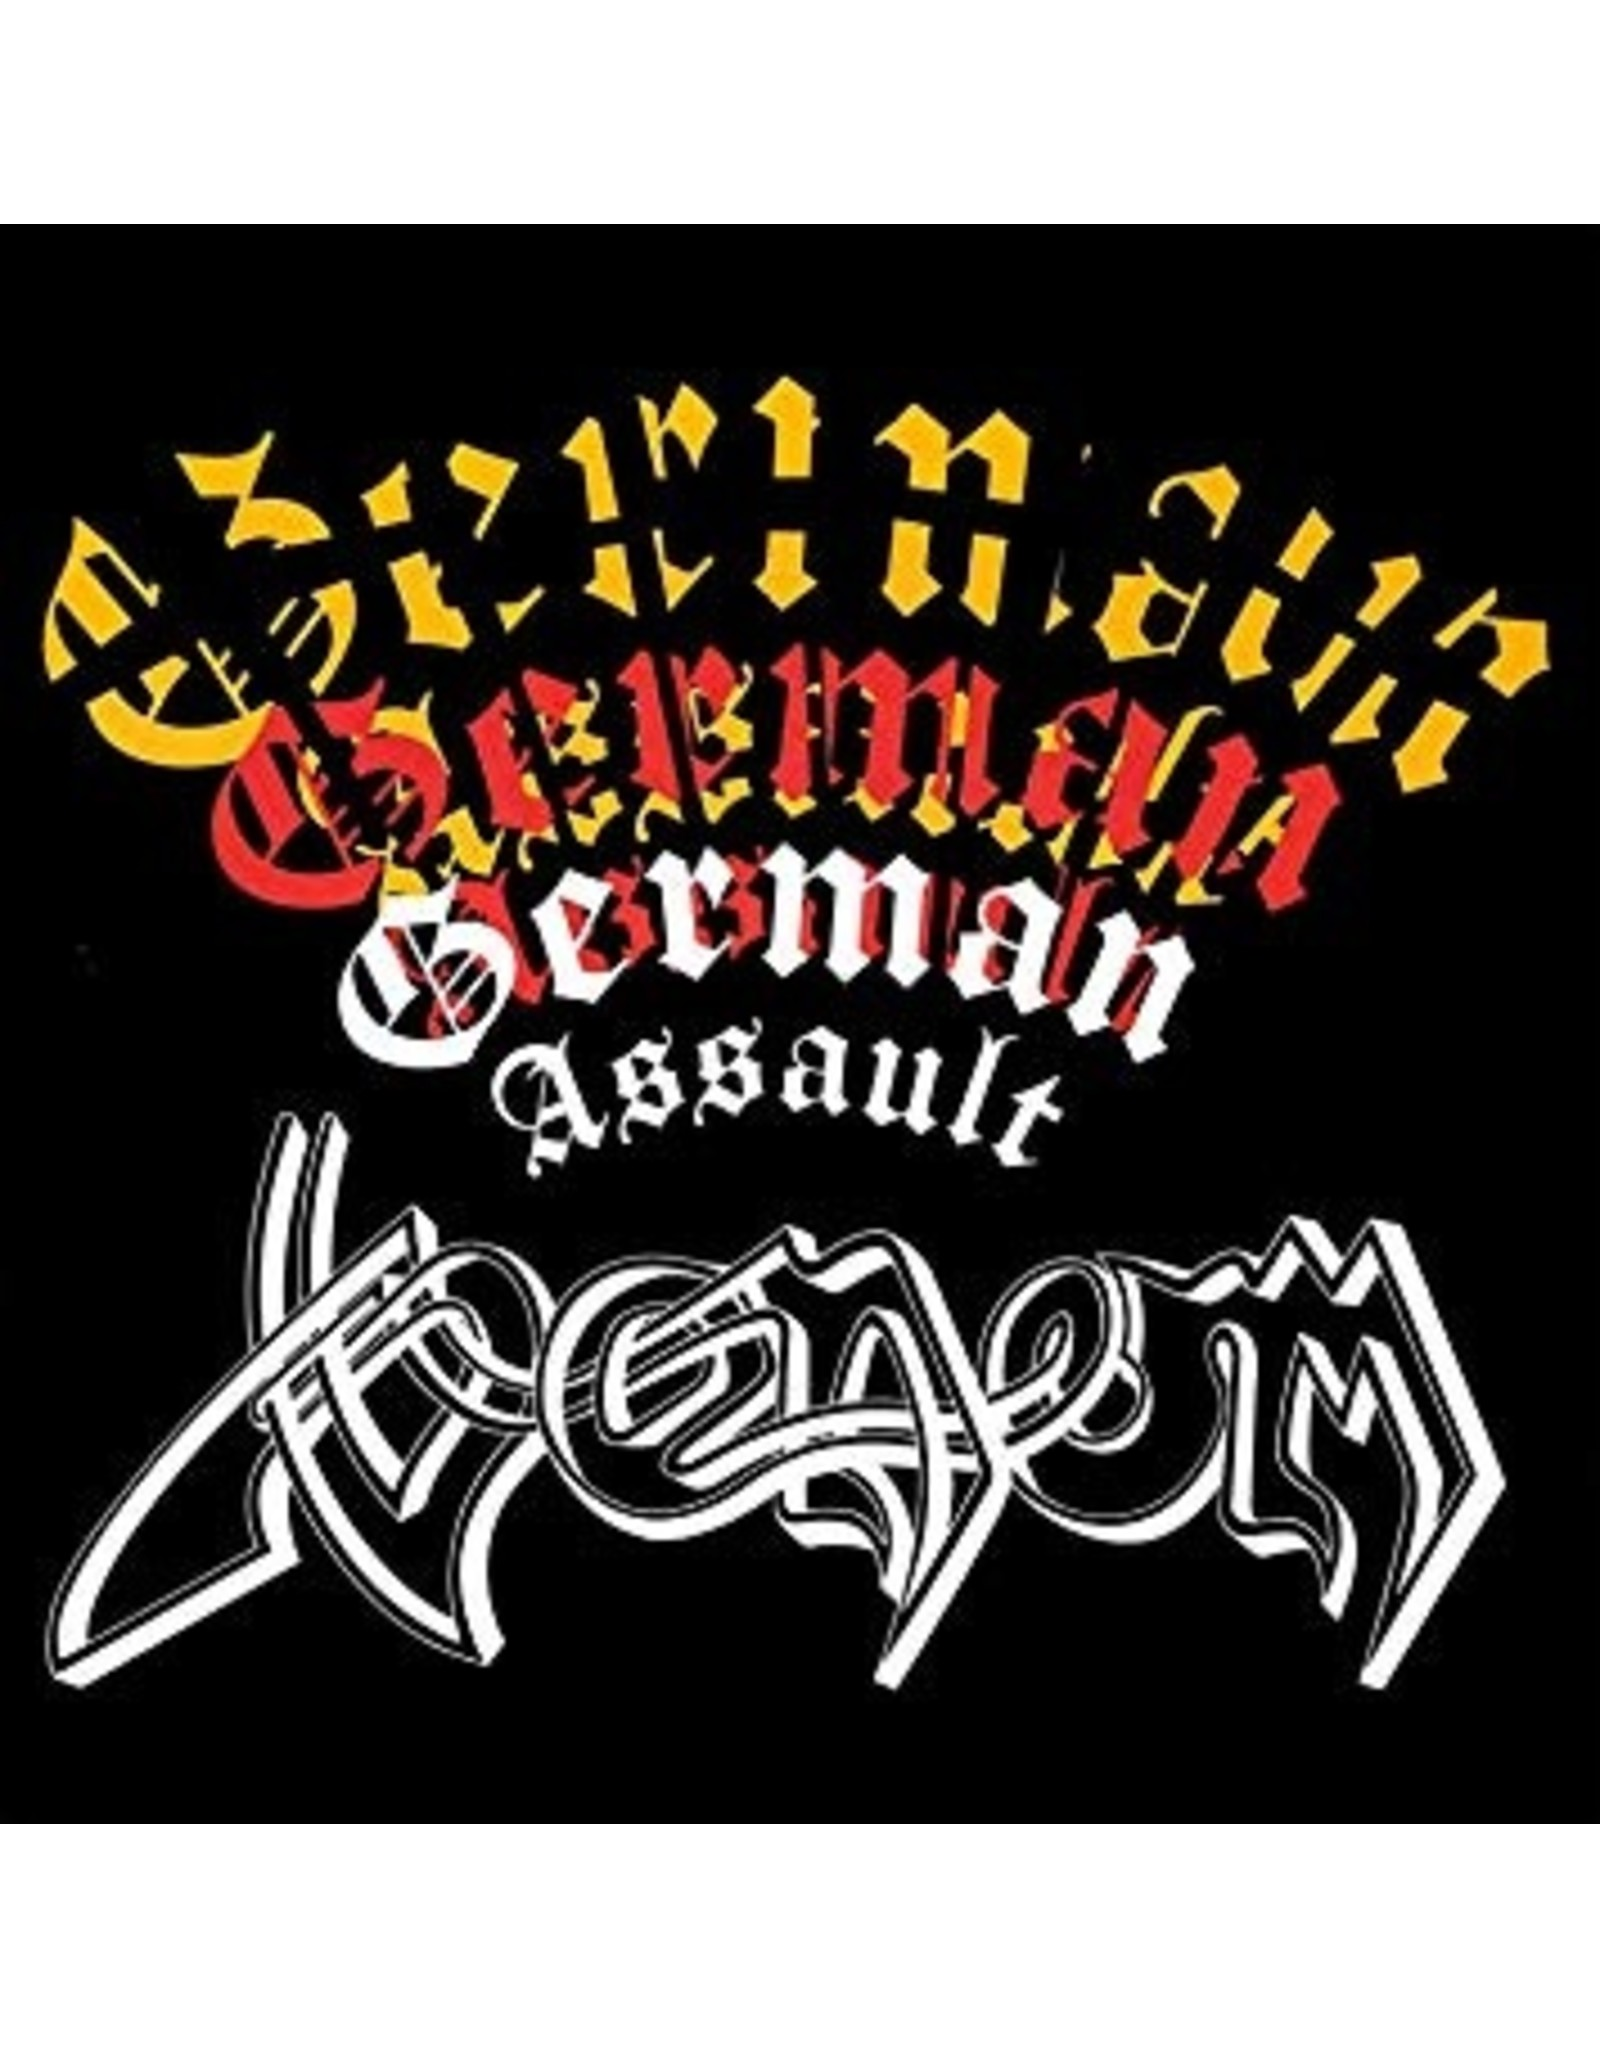 "New Vinyl Venom - German Assault EP 12"""